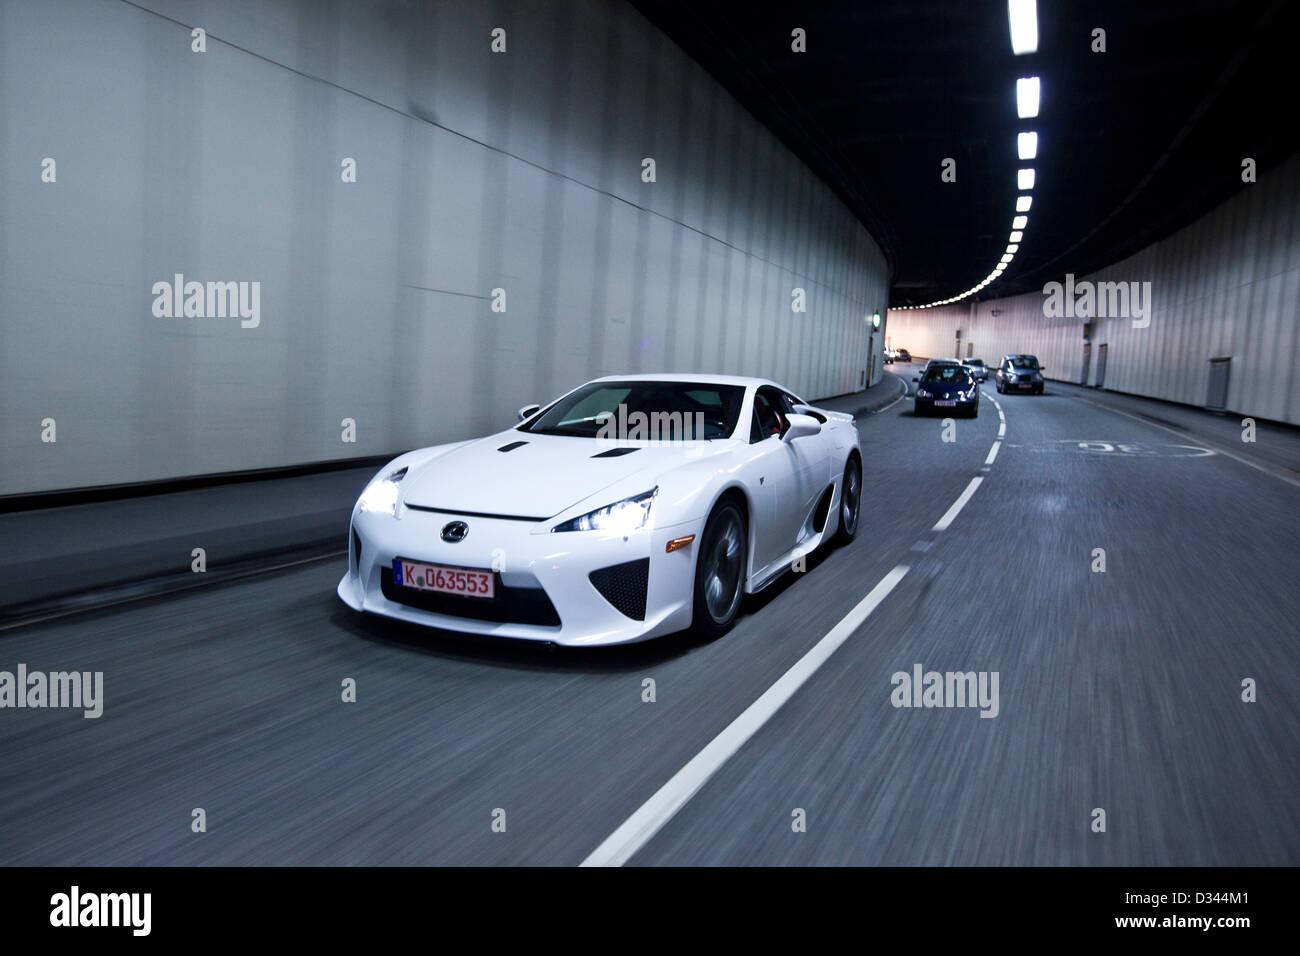 New Lexus Sports Car Lfa Specs